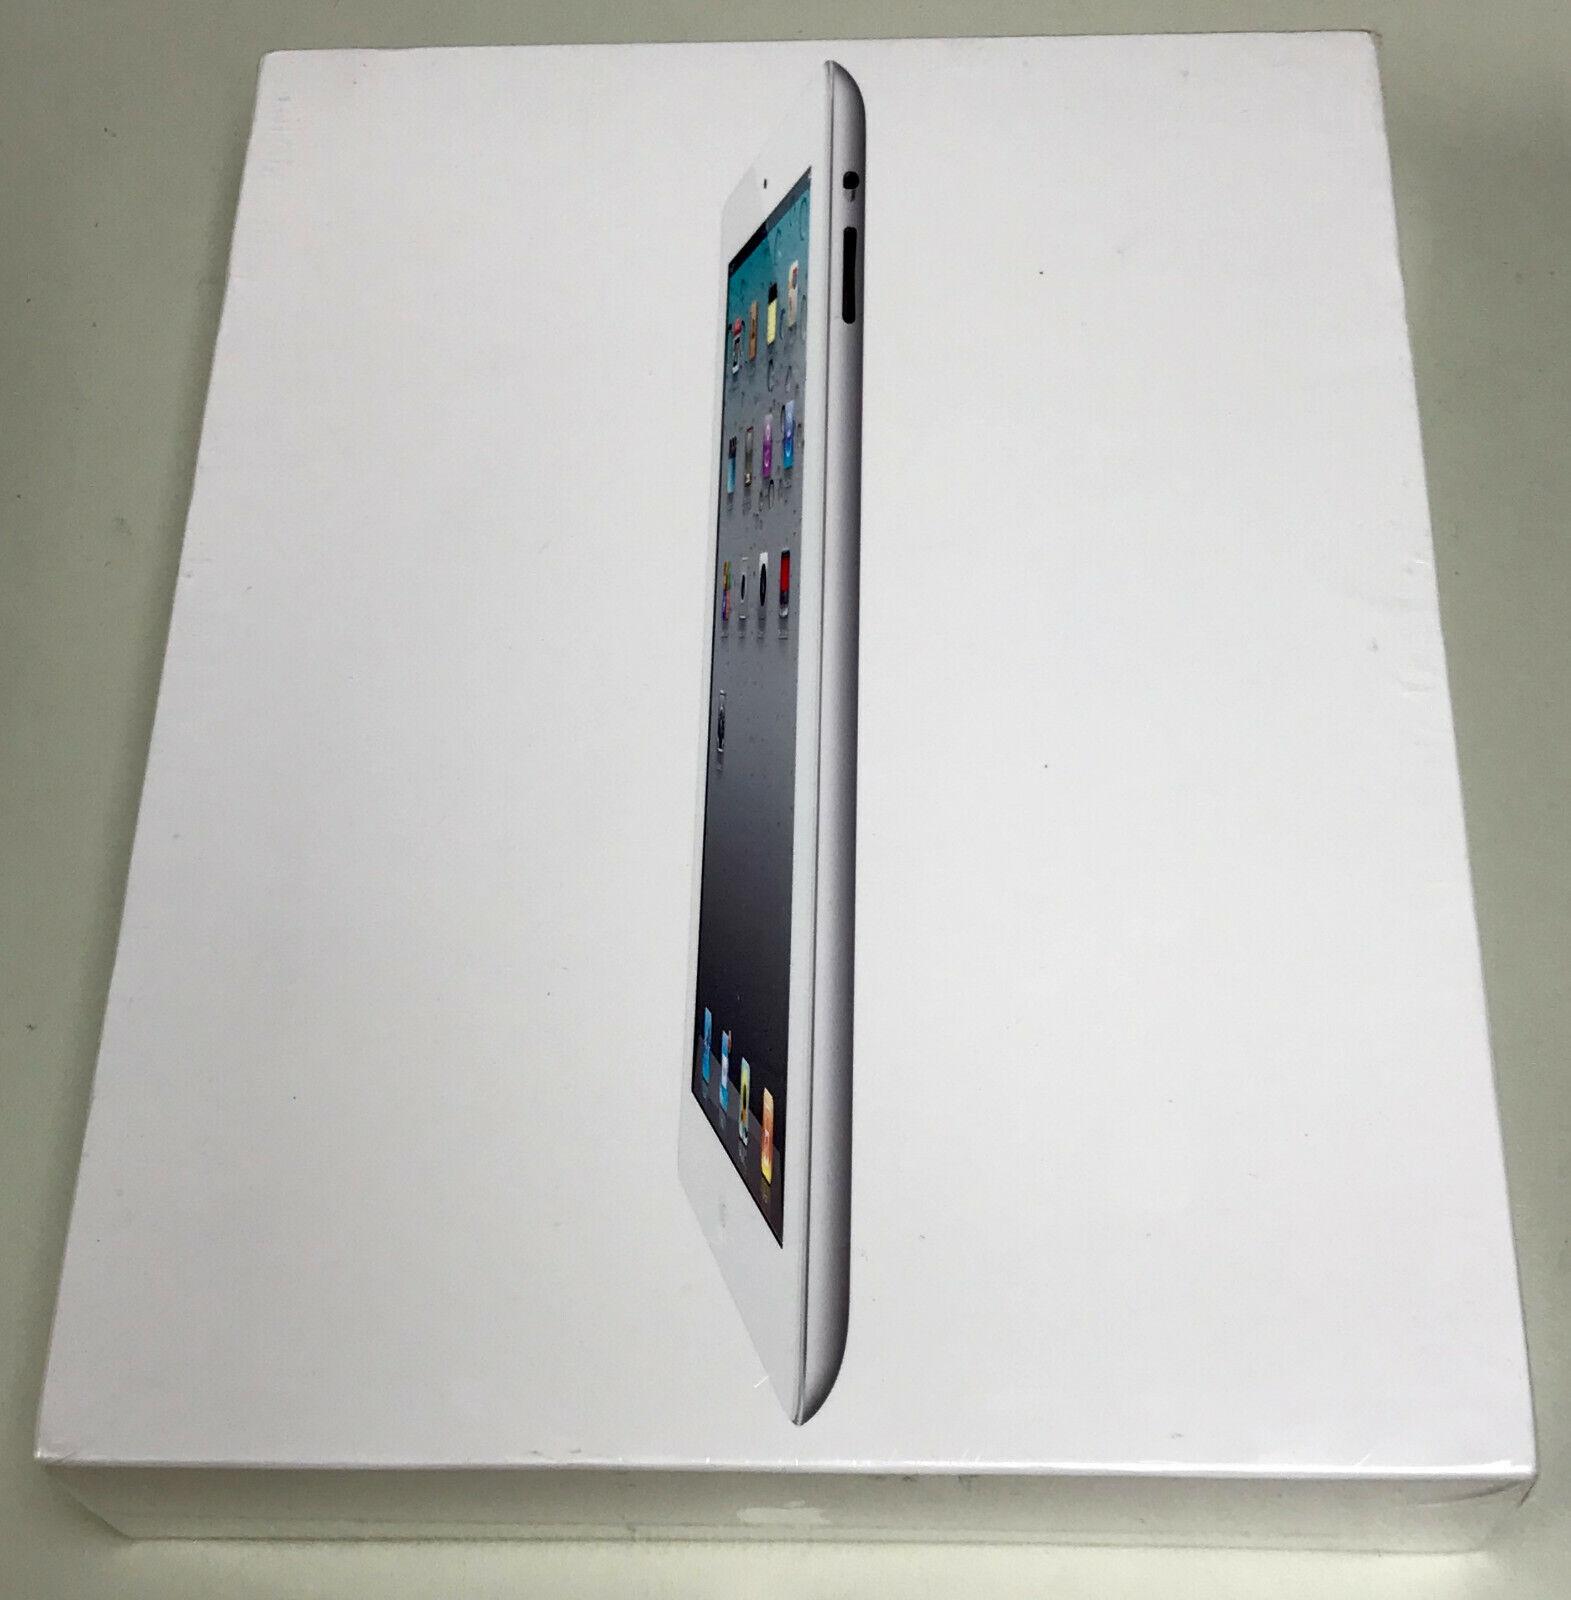 NEW Sealed Apple iPad 2 64GB 3G Unlocked GSM White MC984LL/A